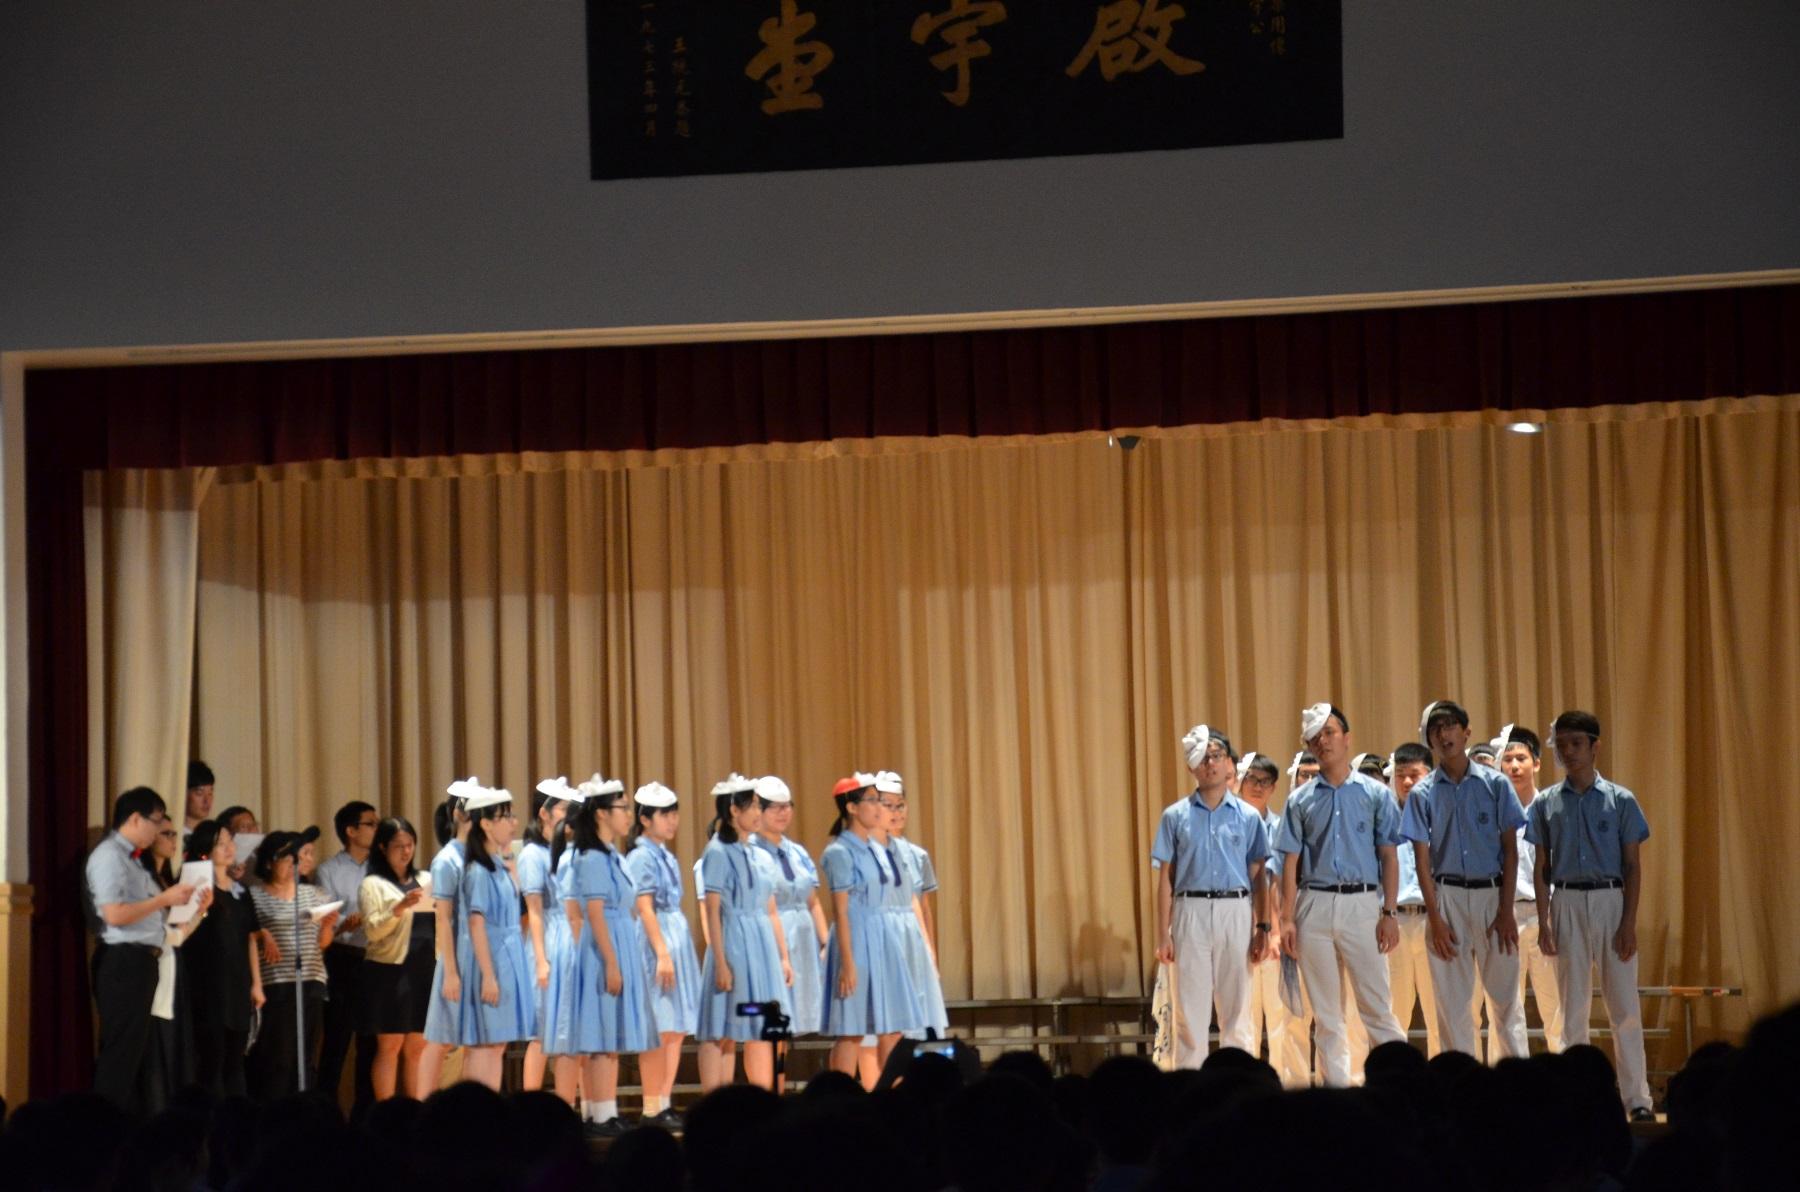 http://www.npc.edu.hk/sites/default/files/dsc_7429.jpg